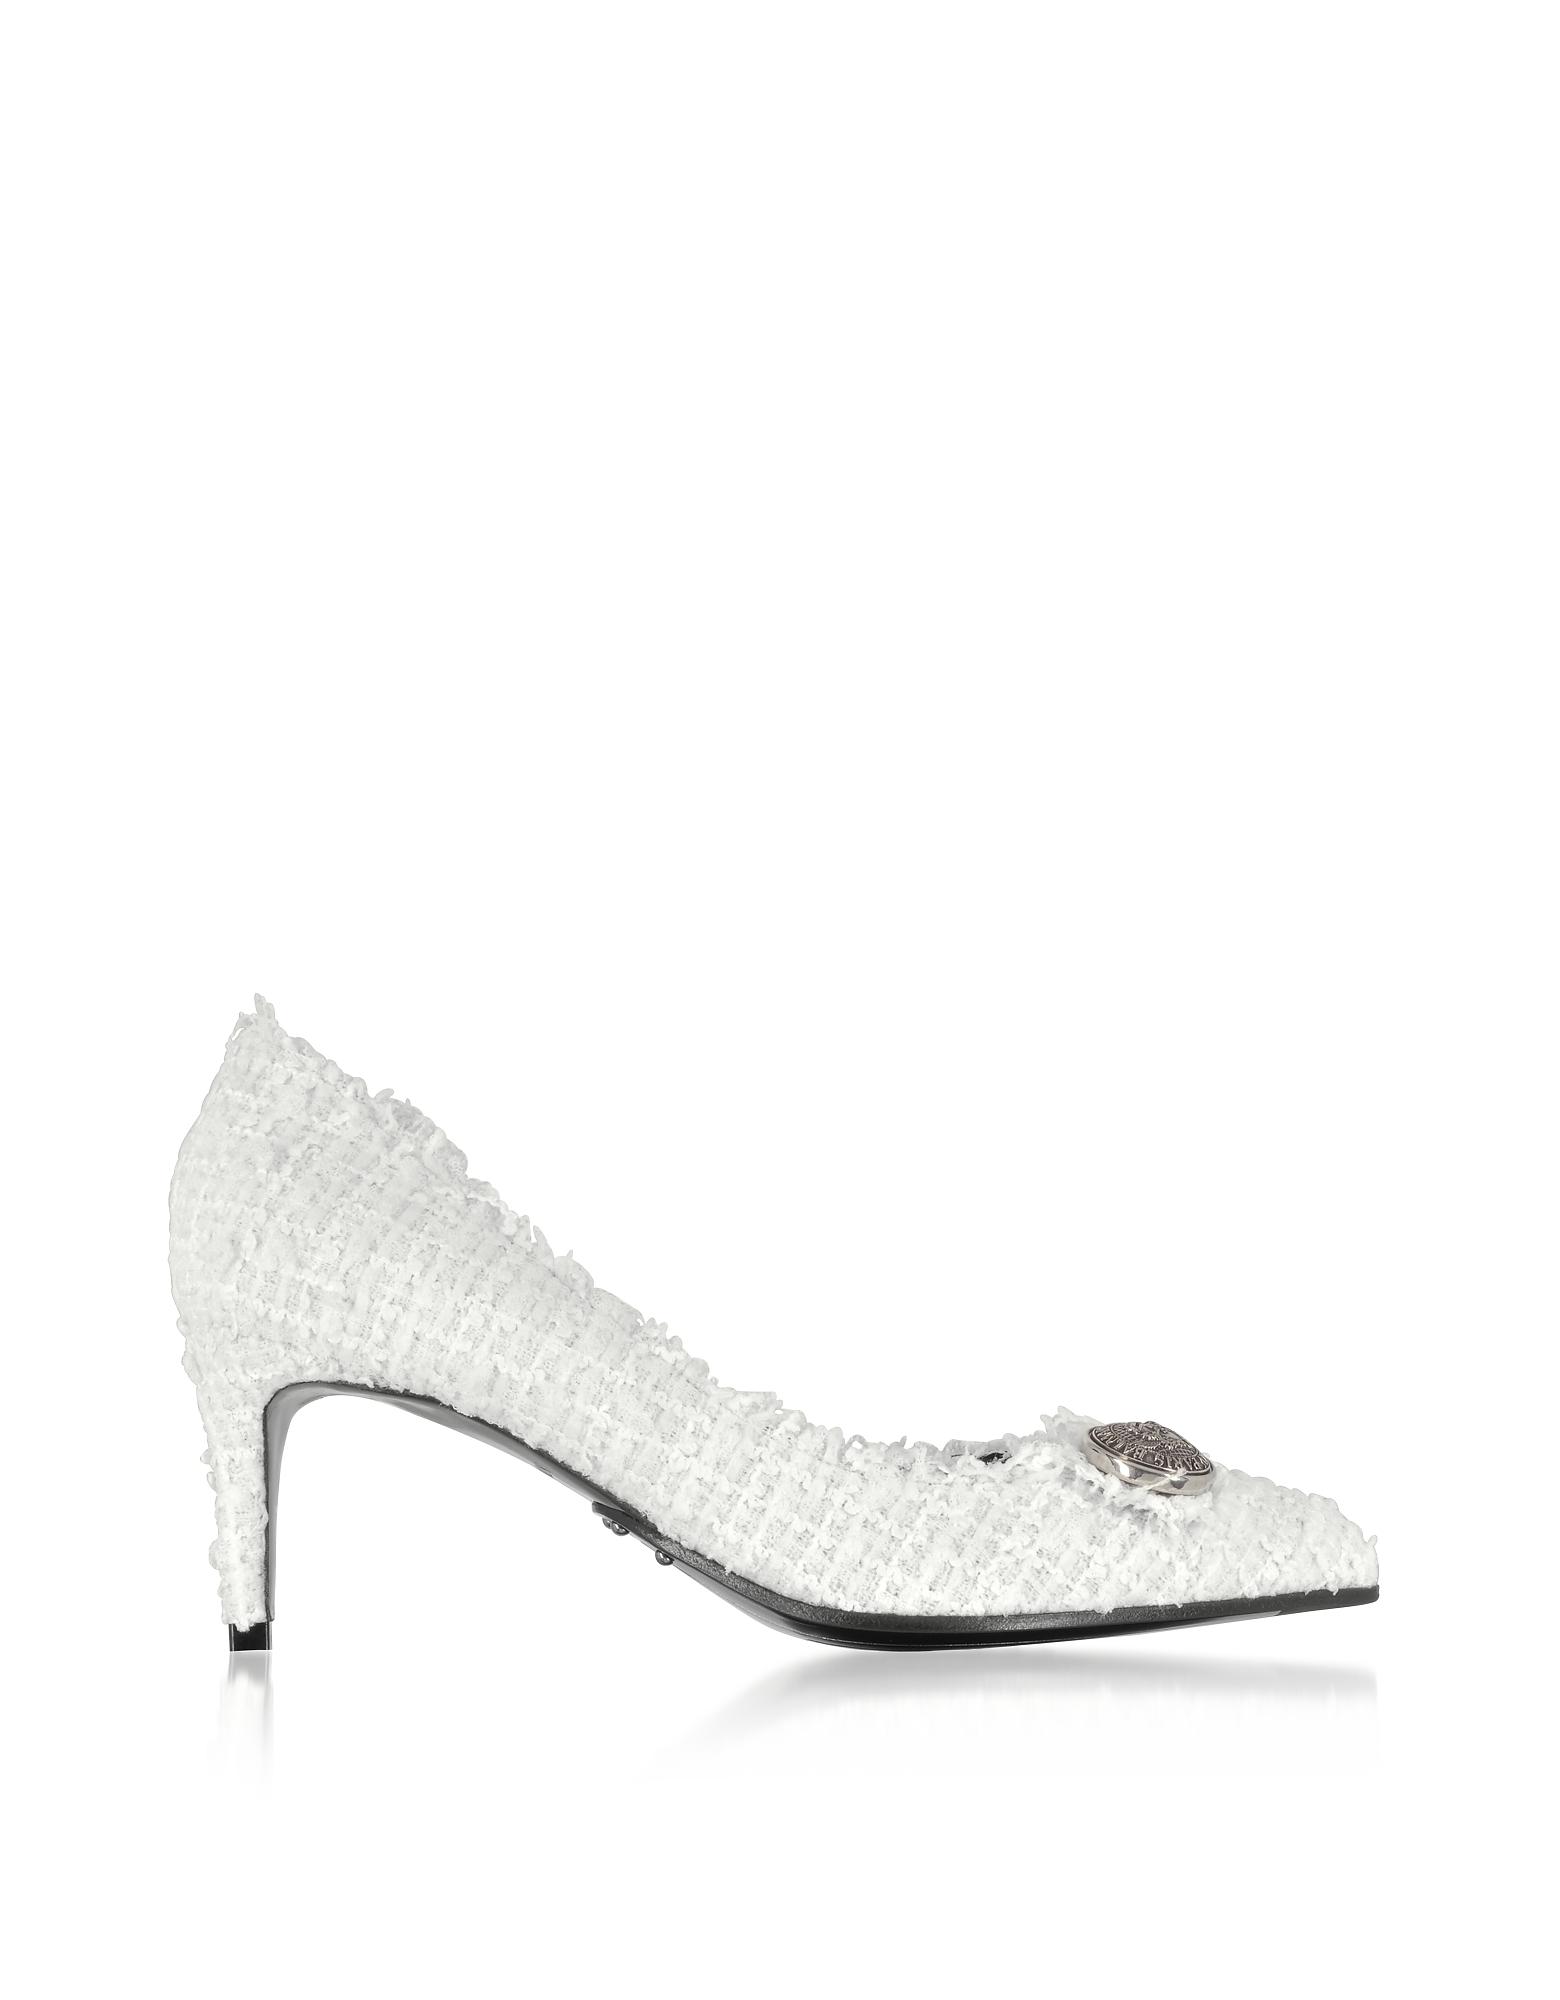 Balmain Designer Shoes, White Tweed 65MM Julie Pump